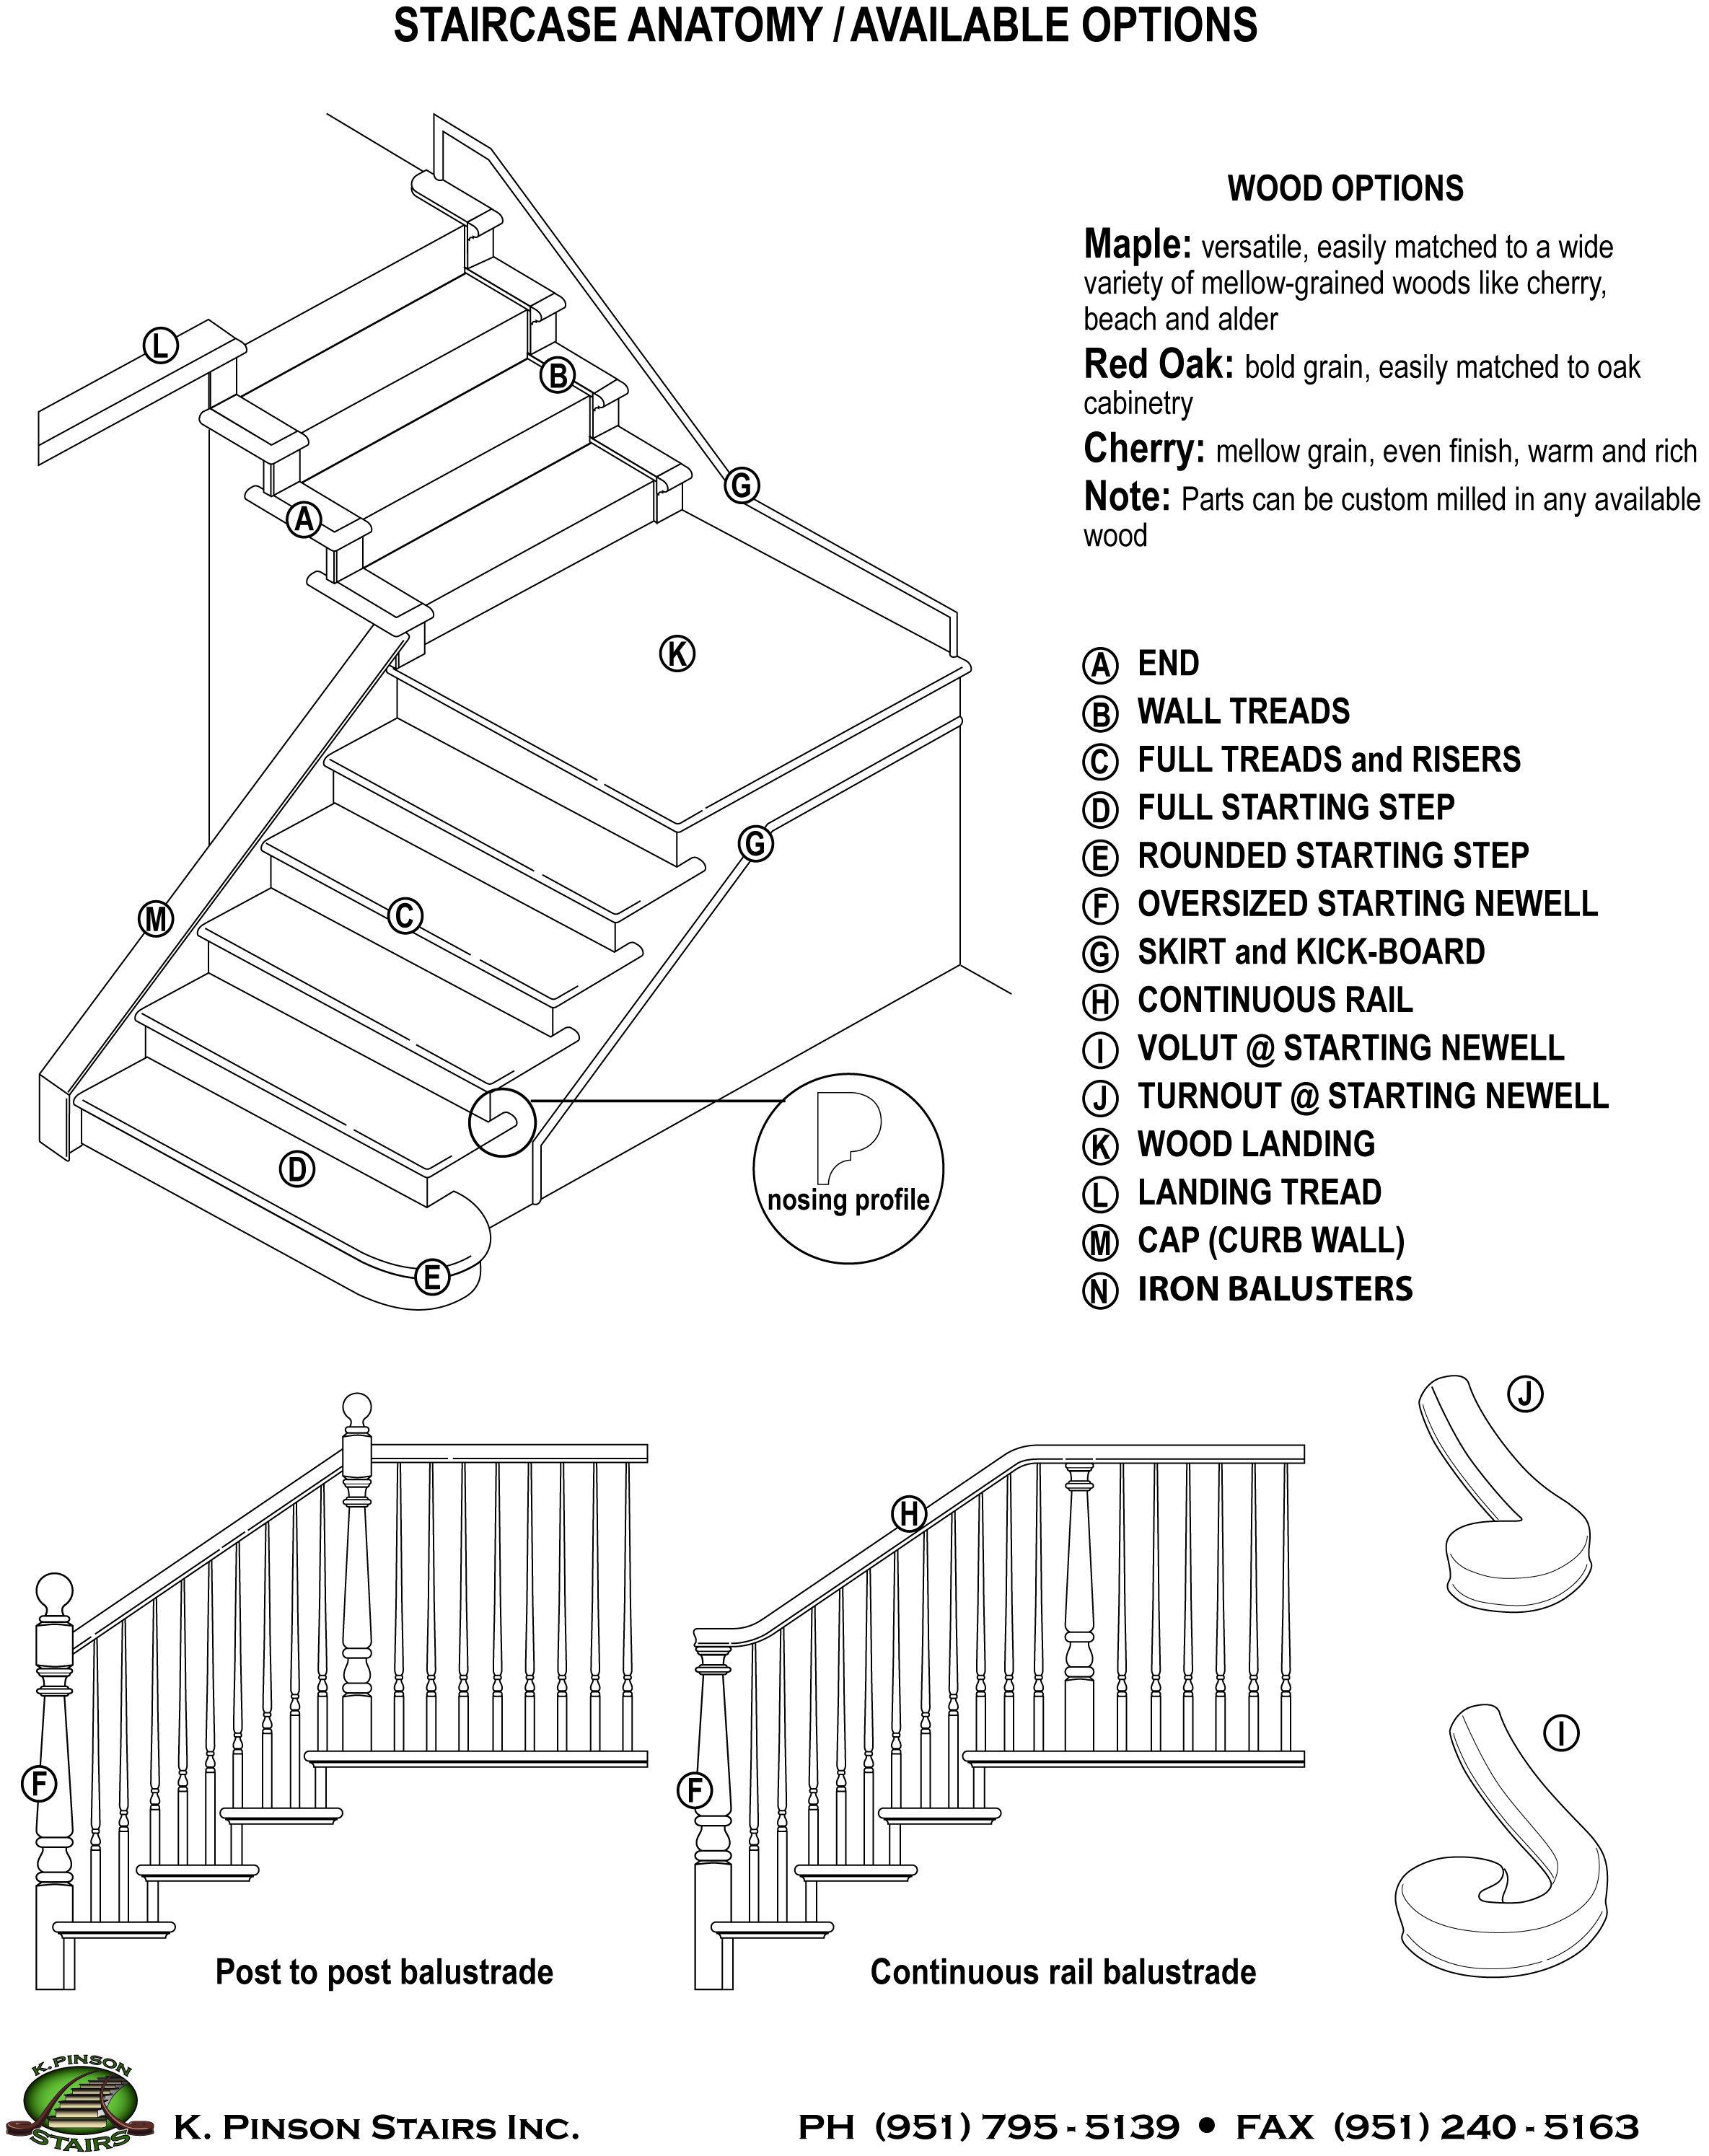 staircase anatomy [ 2369 x 2989 Pixel ]